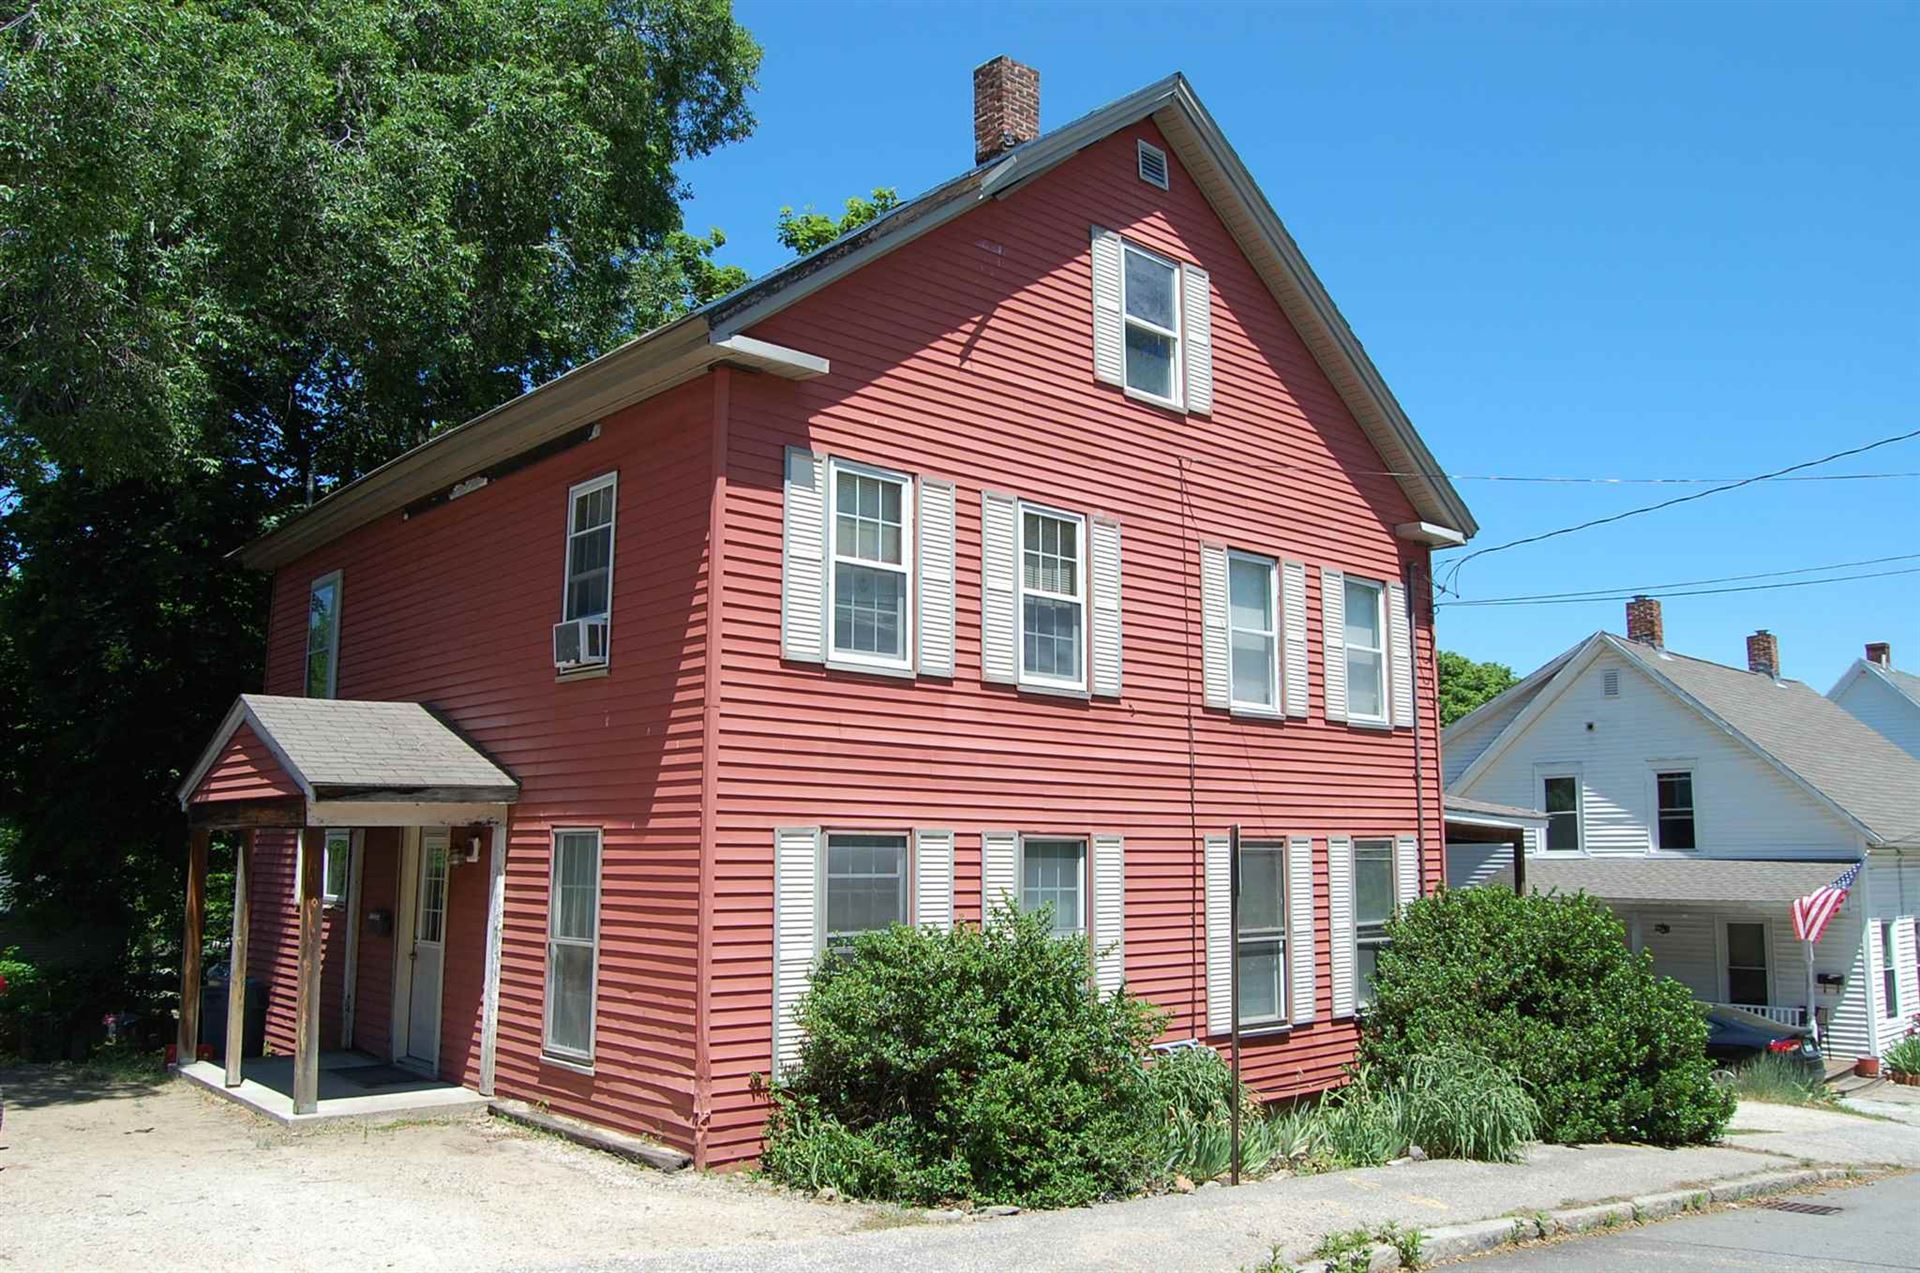 14-16 Highland Street, Concord, NH 03301 - #: 4811991